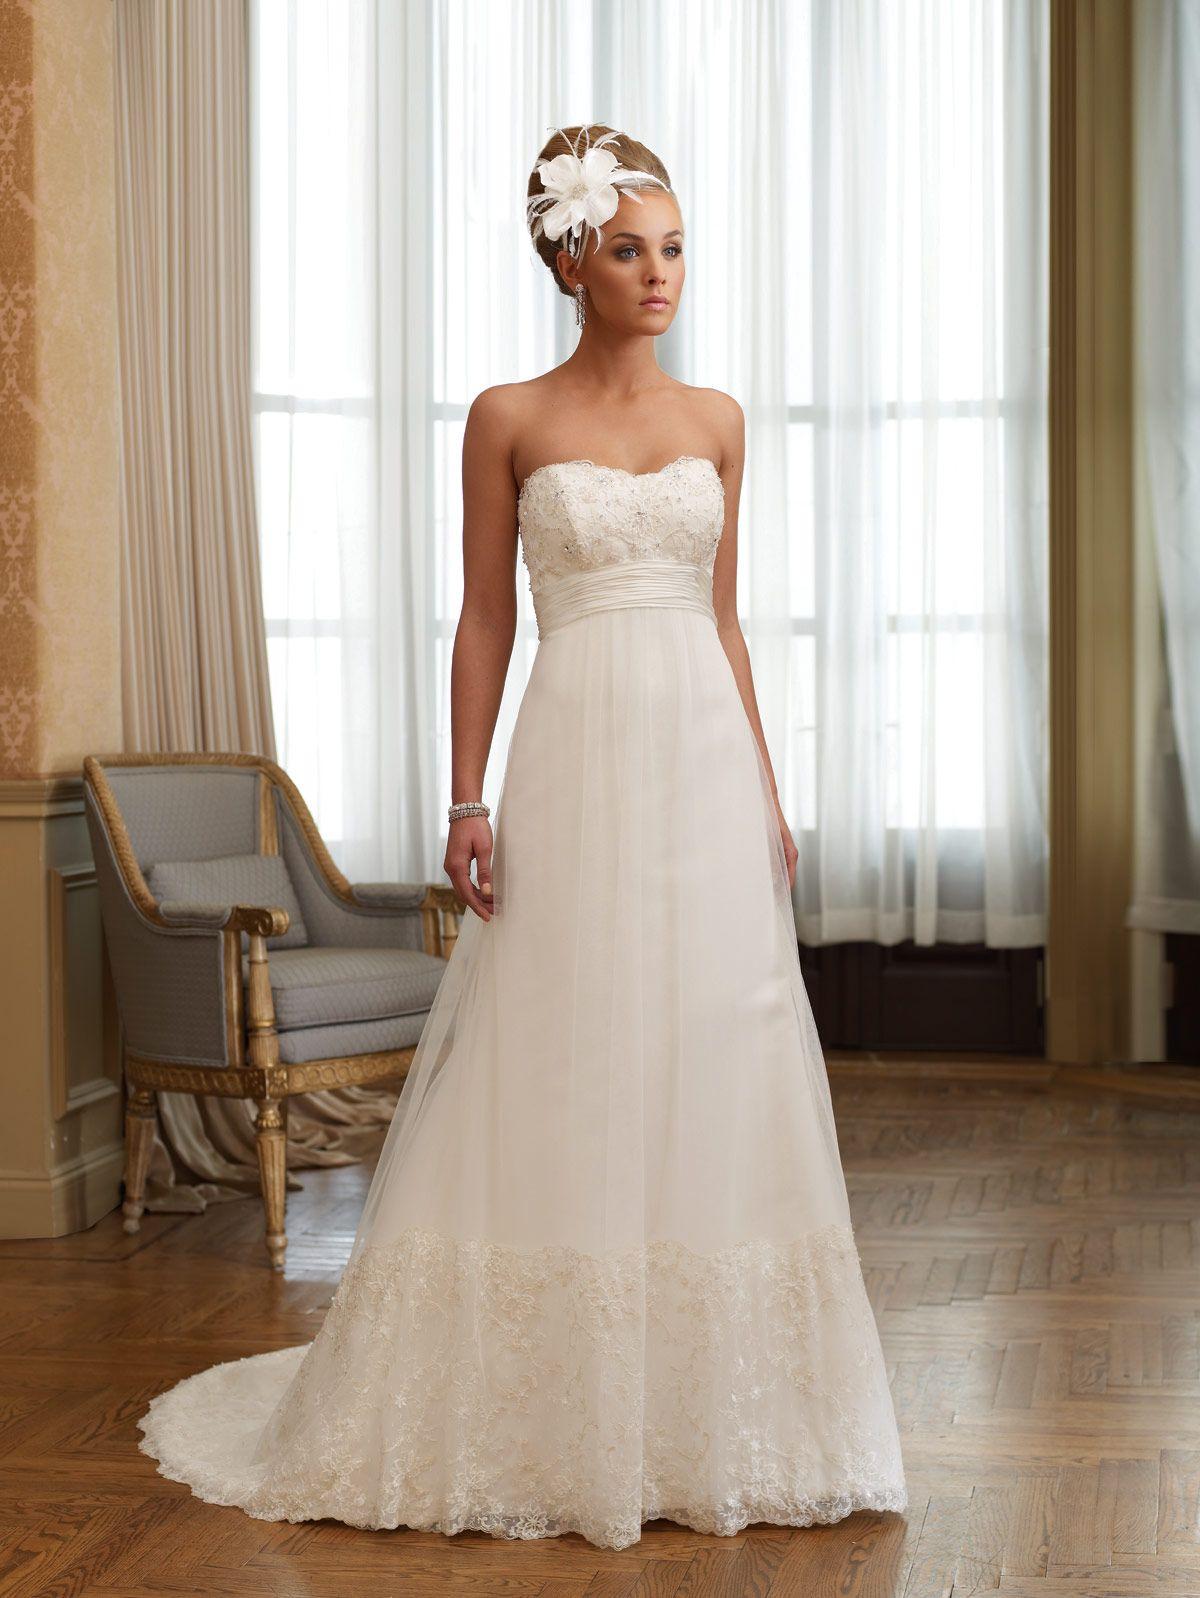 Maternity wedding dresses david's bridal  David Tutera   Kaylee  David Tutera for Mon Cheri Contest